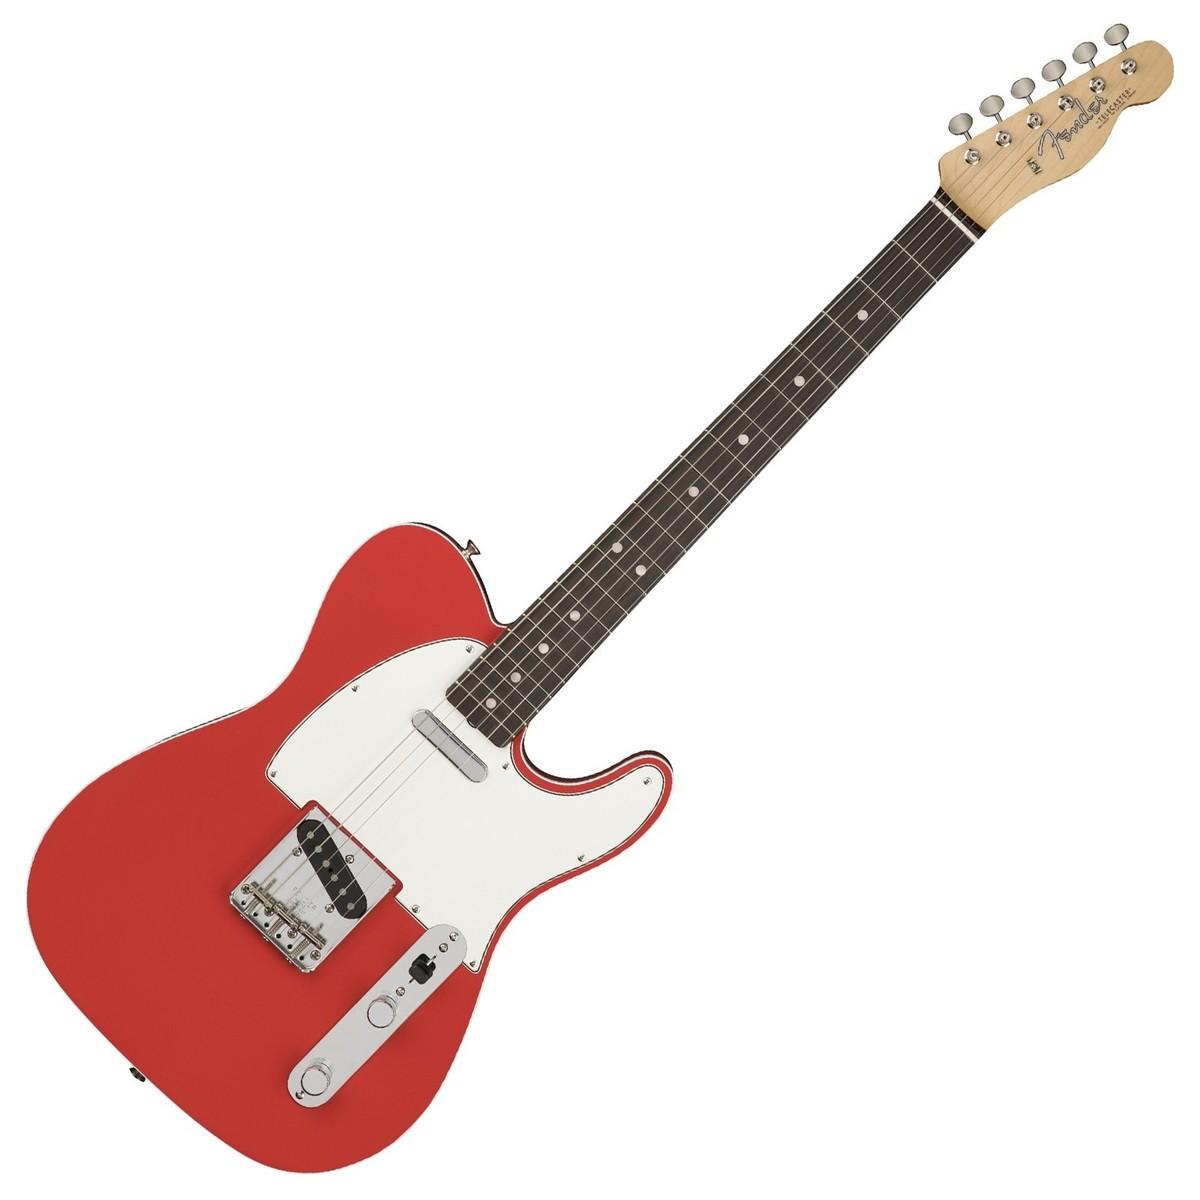 Fender American Original 60 Telecaster RW Fiesta Red elektrinė gitara Made in USA